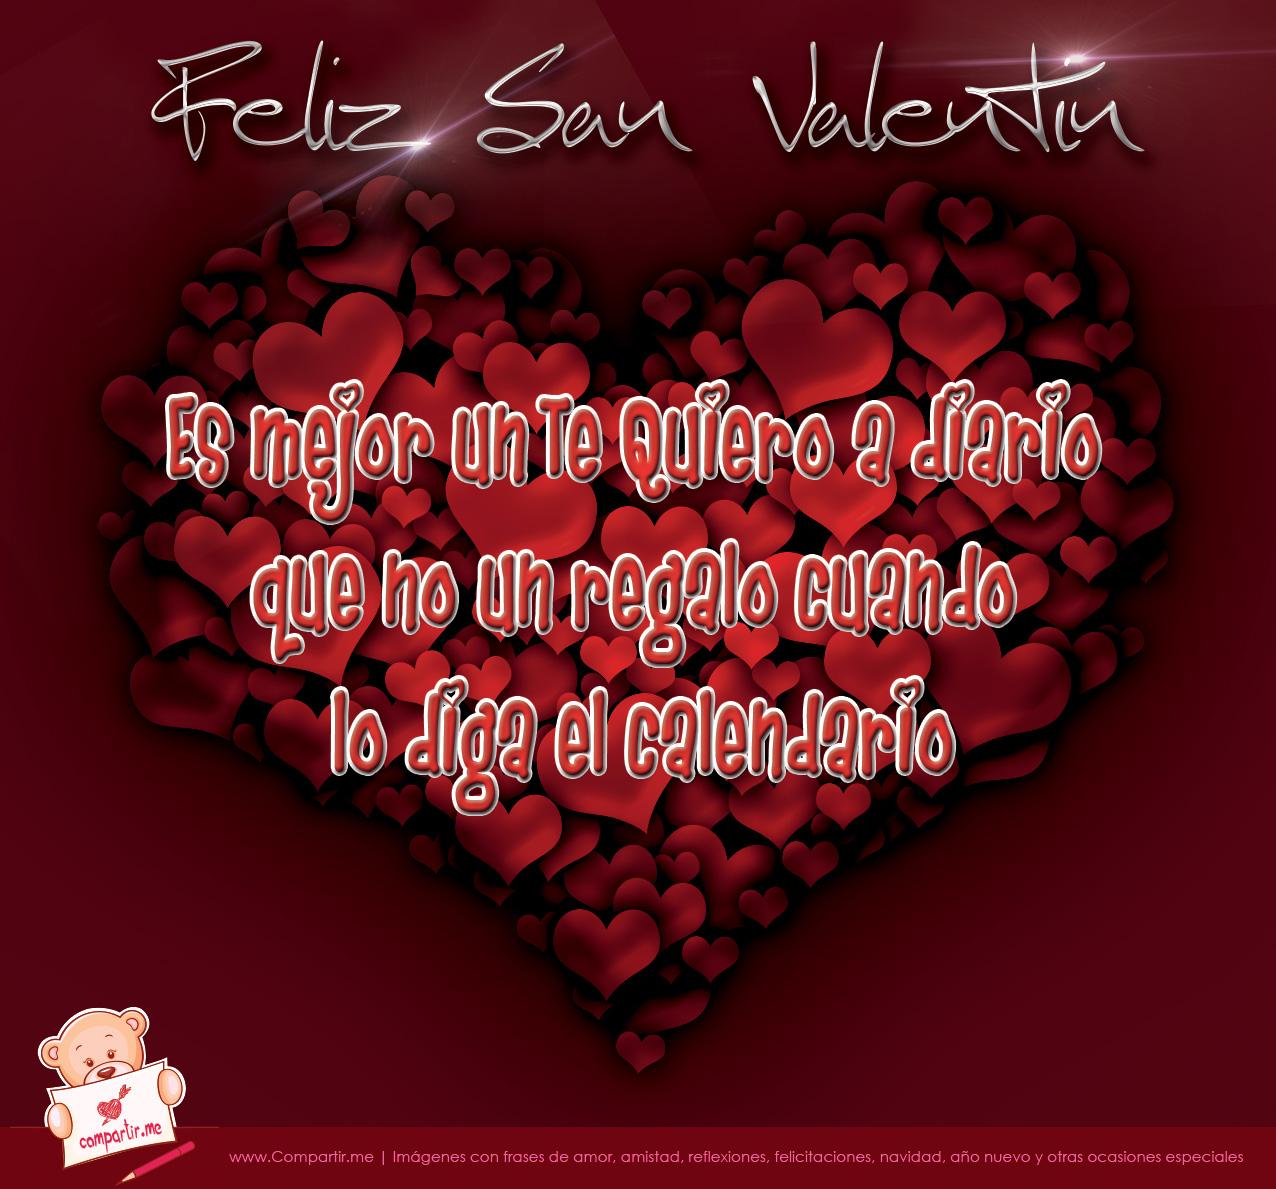 Feliz dia de San Valentin! Corazon-frase-san-valentin-5